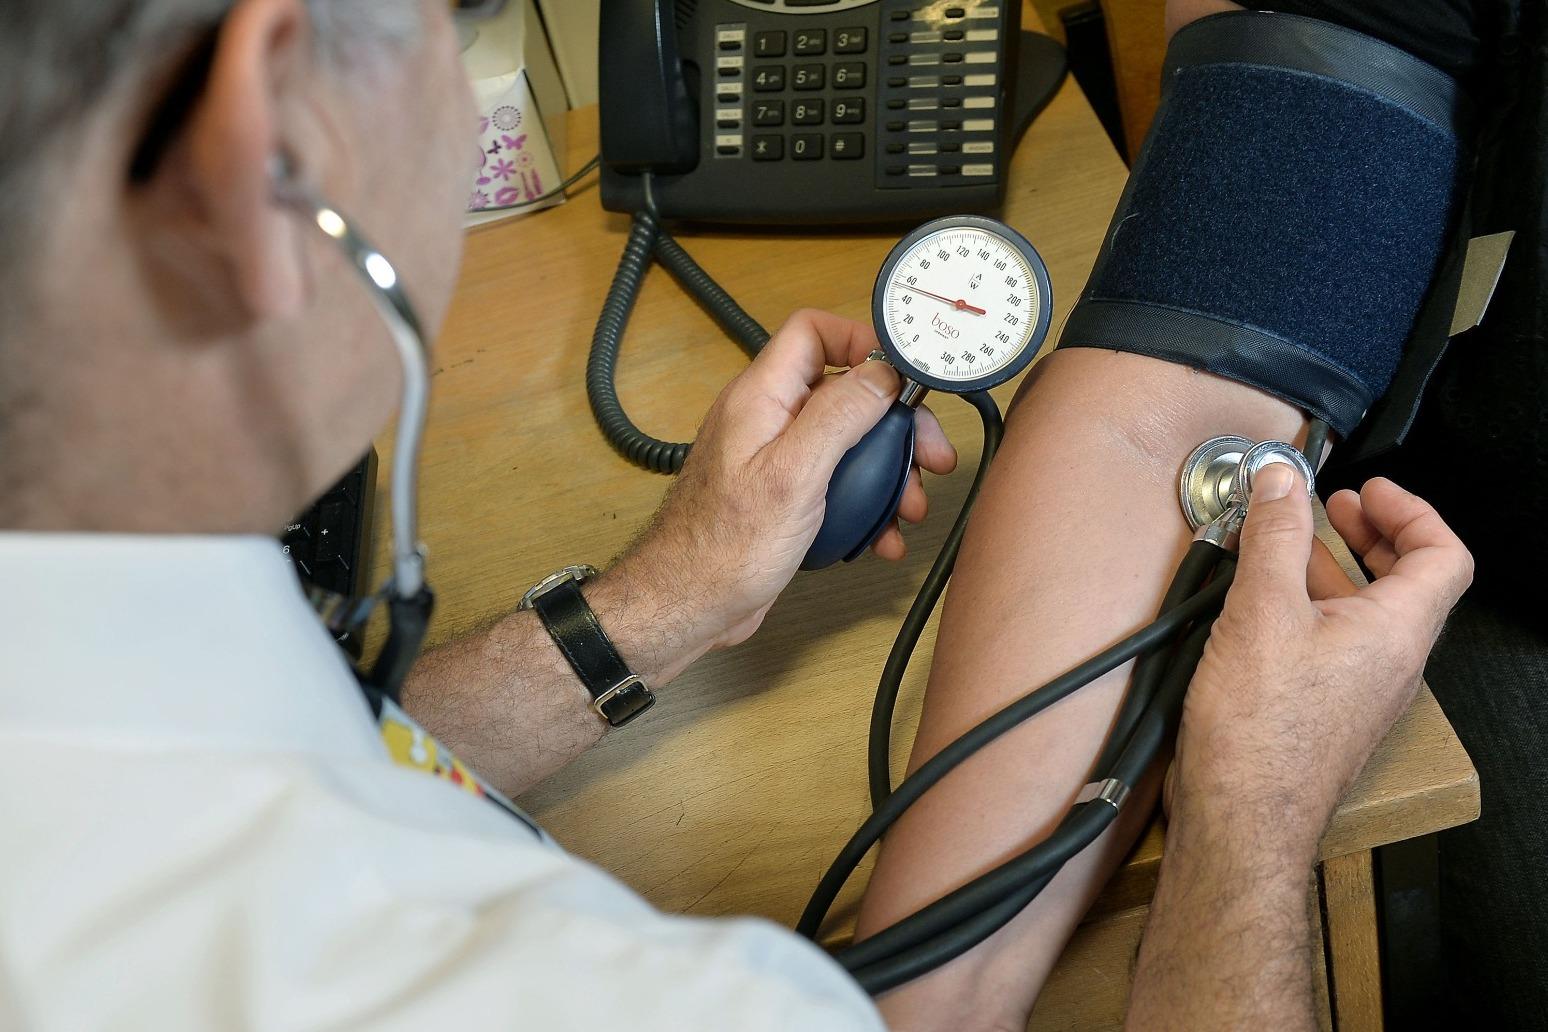 GP shortage in poorer areas 'could widen health inequalities'